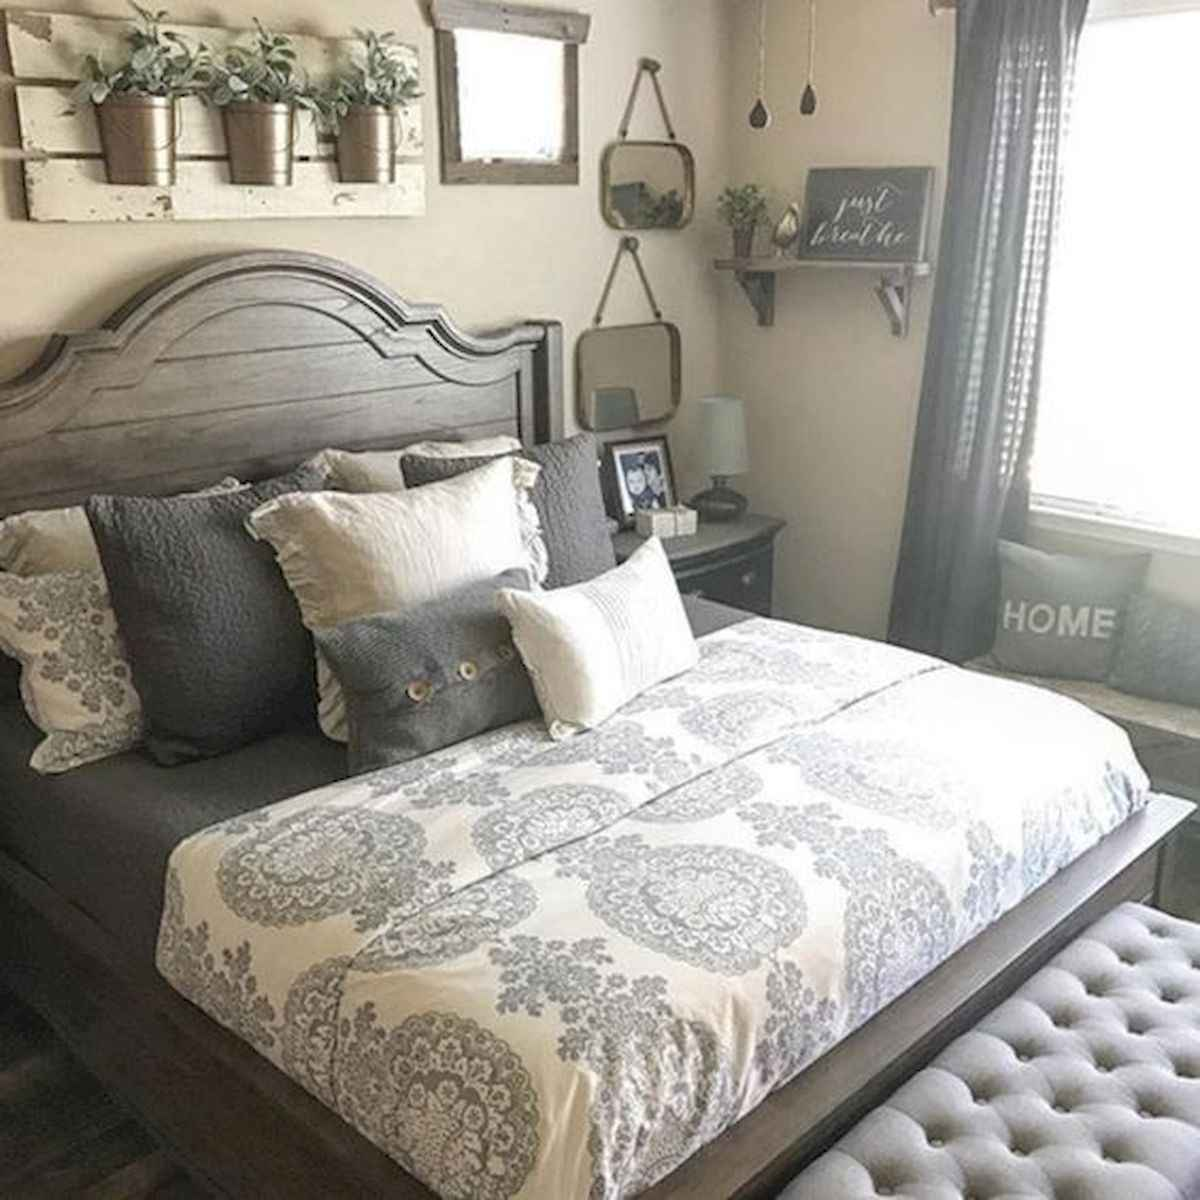 50 Favorite Bedding for Farmhouse Bedroom Design Ideas and Decor (21)